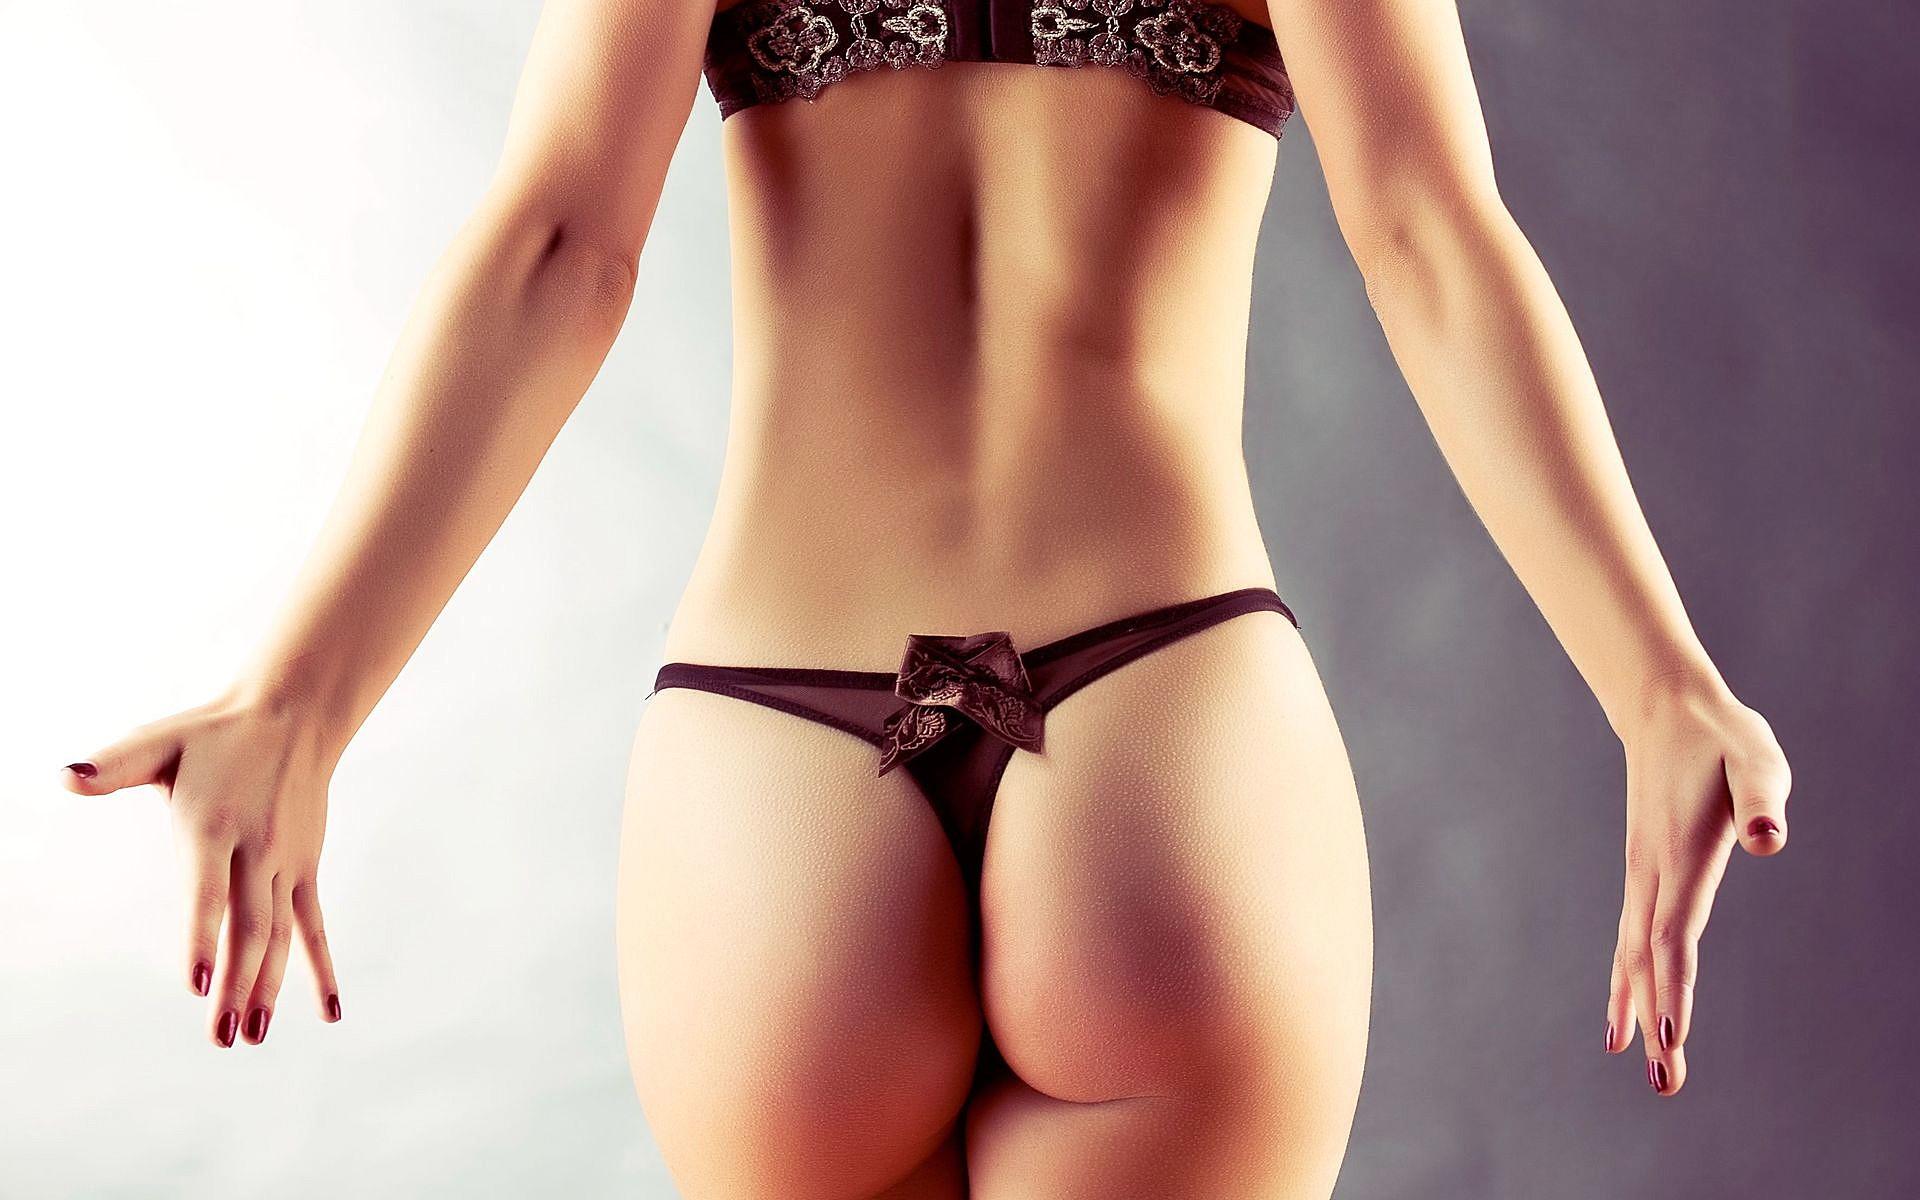 porno-videos girl thong mega-sex mit kleine erbse